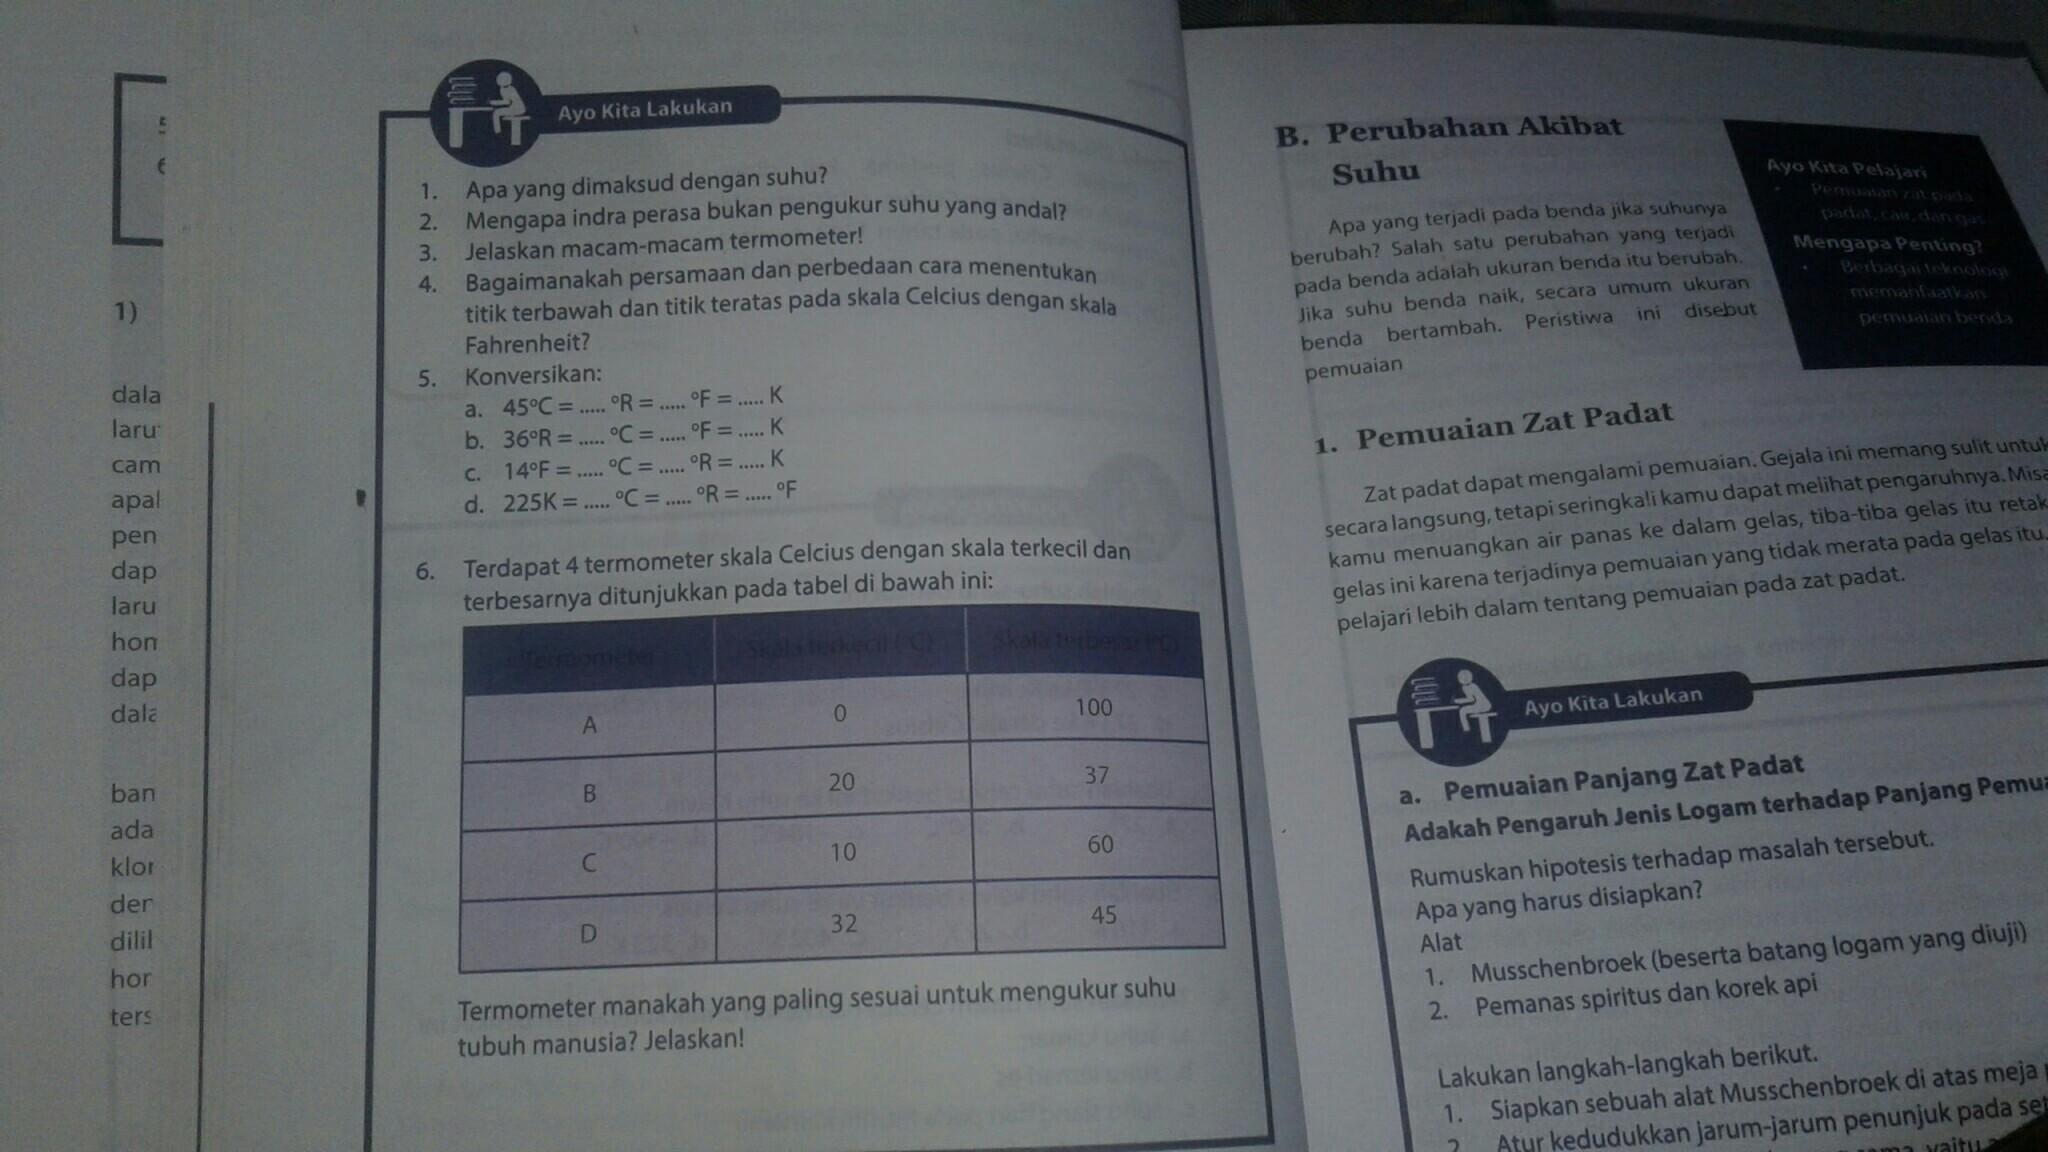 Ipa Halaman 144 145 Kelas 7 Tolong Dibantu Ya Besok Di Kumpulkan Terima Kasih Brainly Co Id